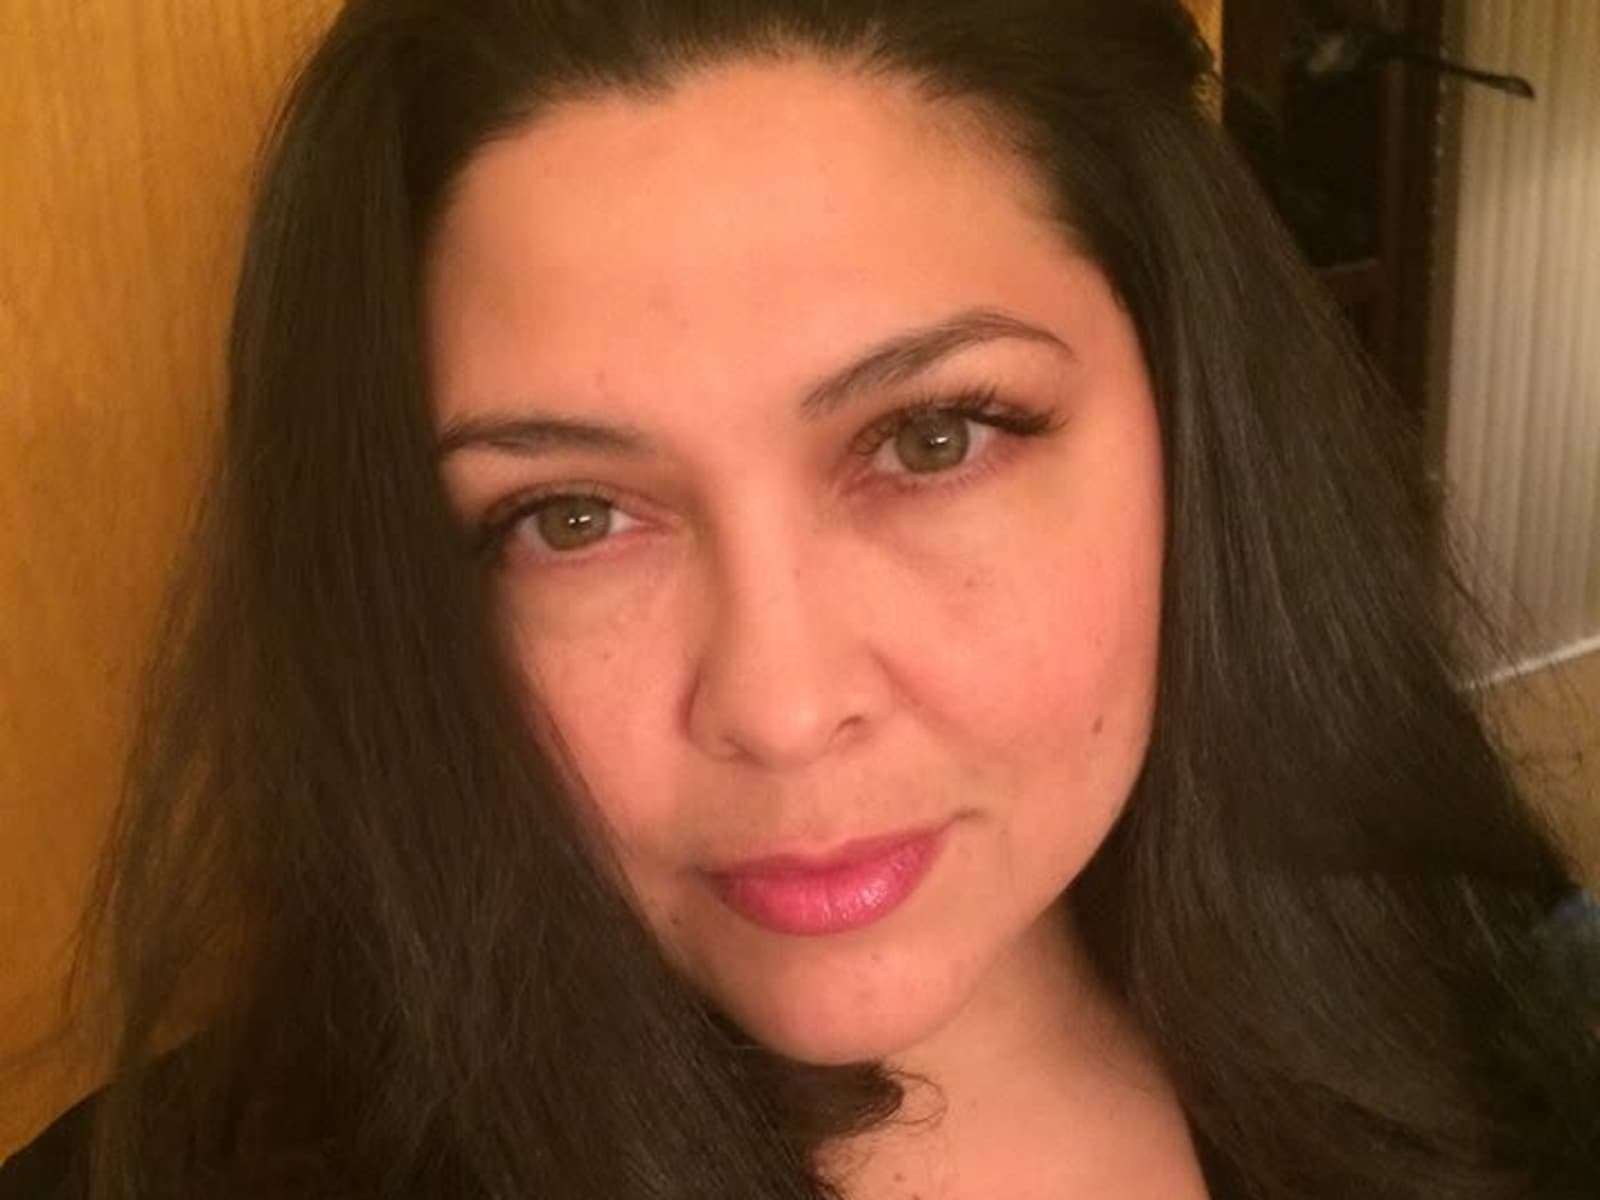 Christina from Wichita, Kansas, United States